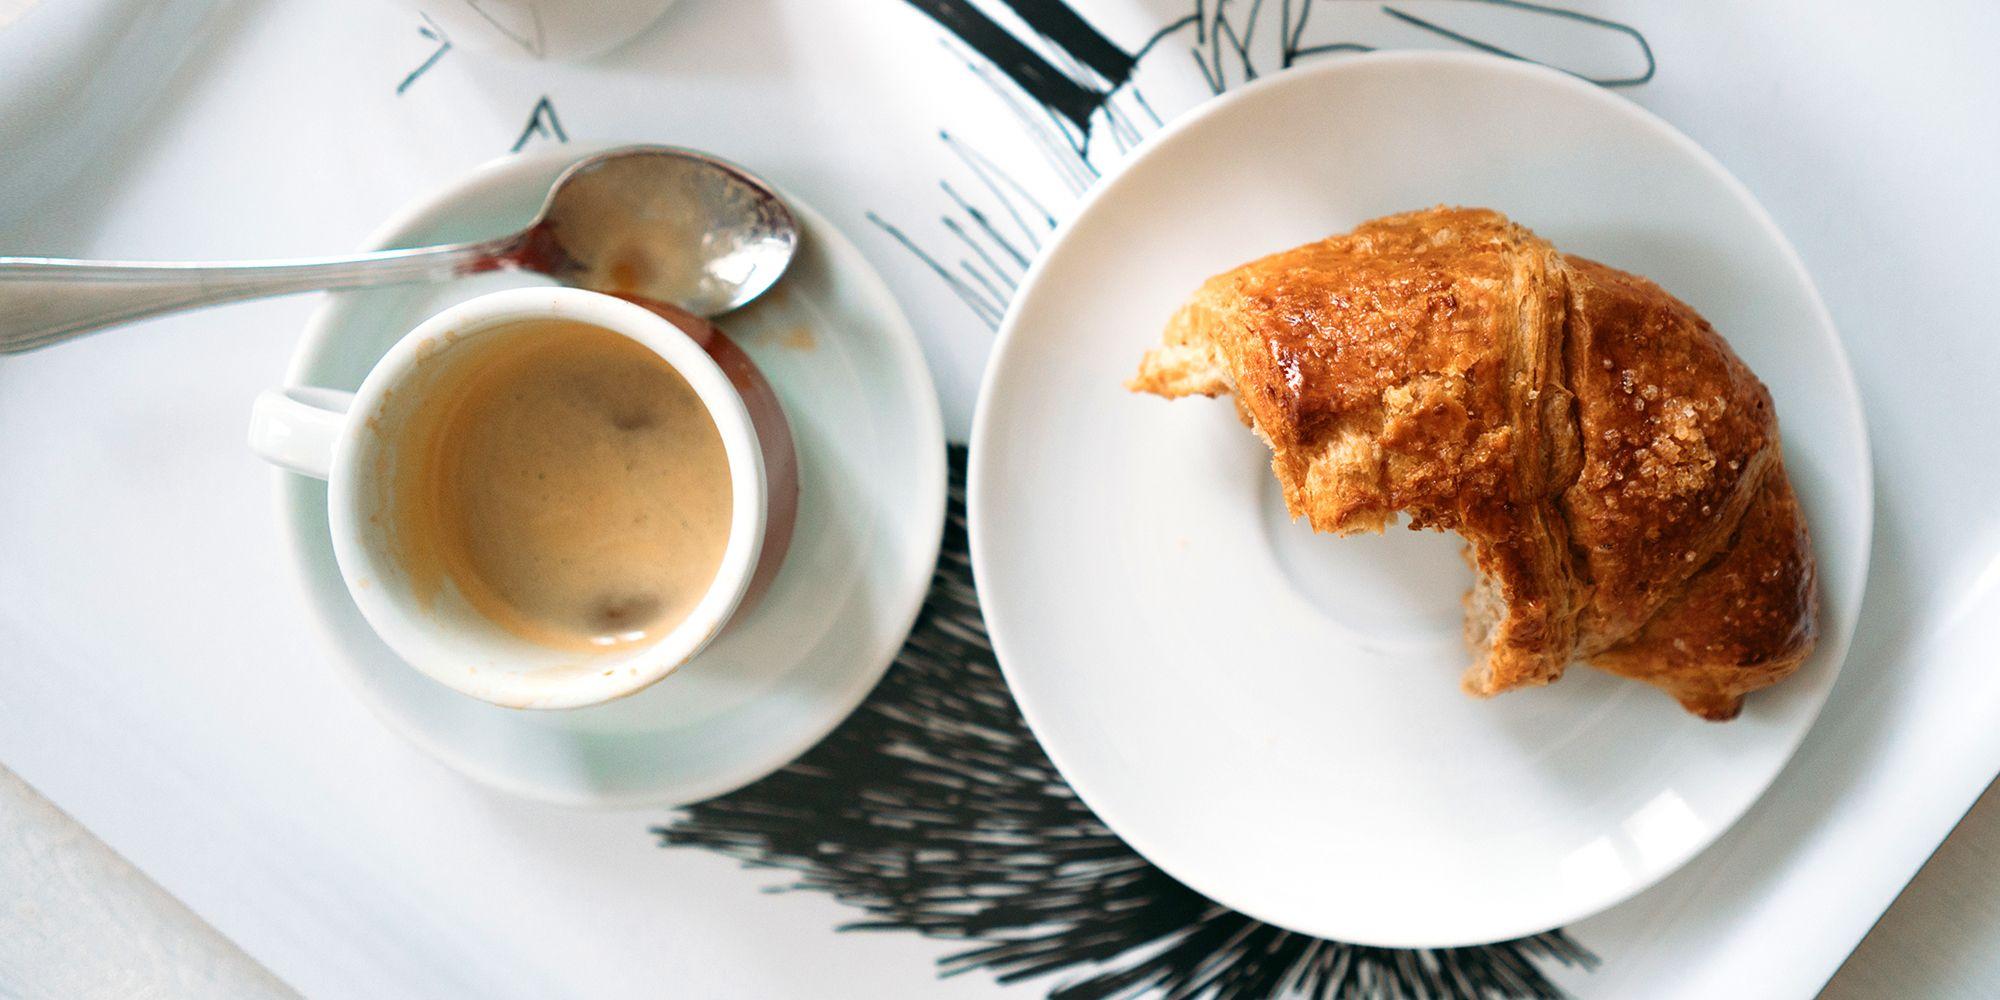 Get Your Caffeine Fix With These 9 Best Espresso Brands